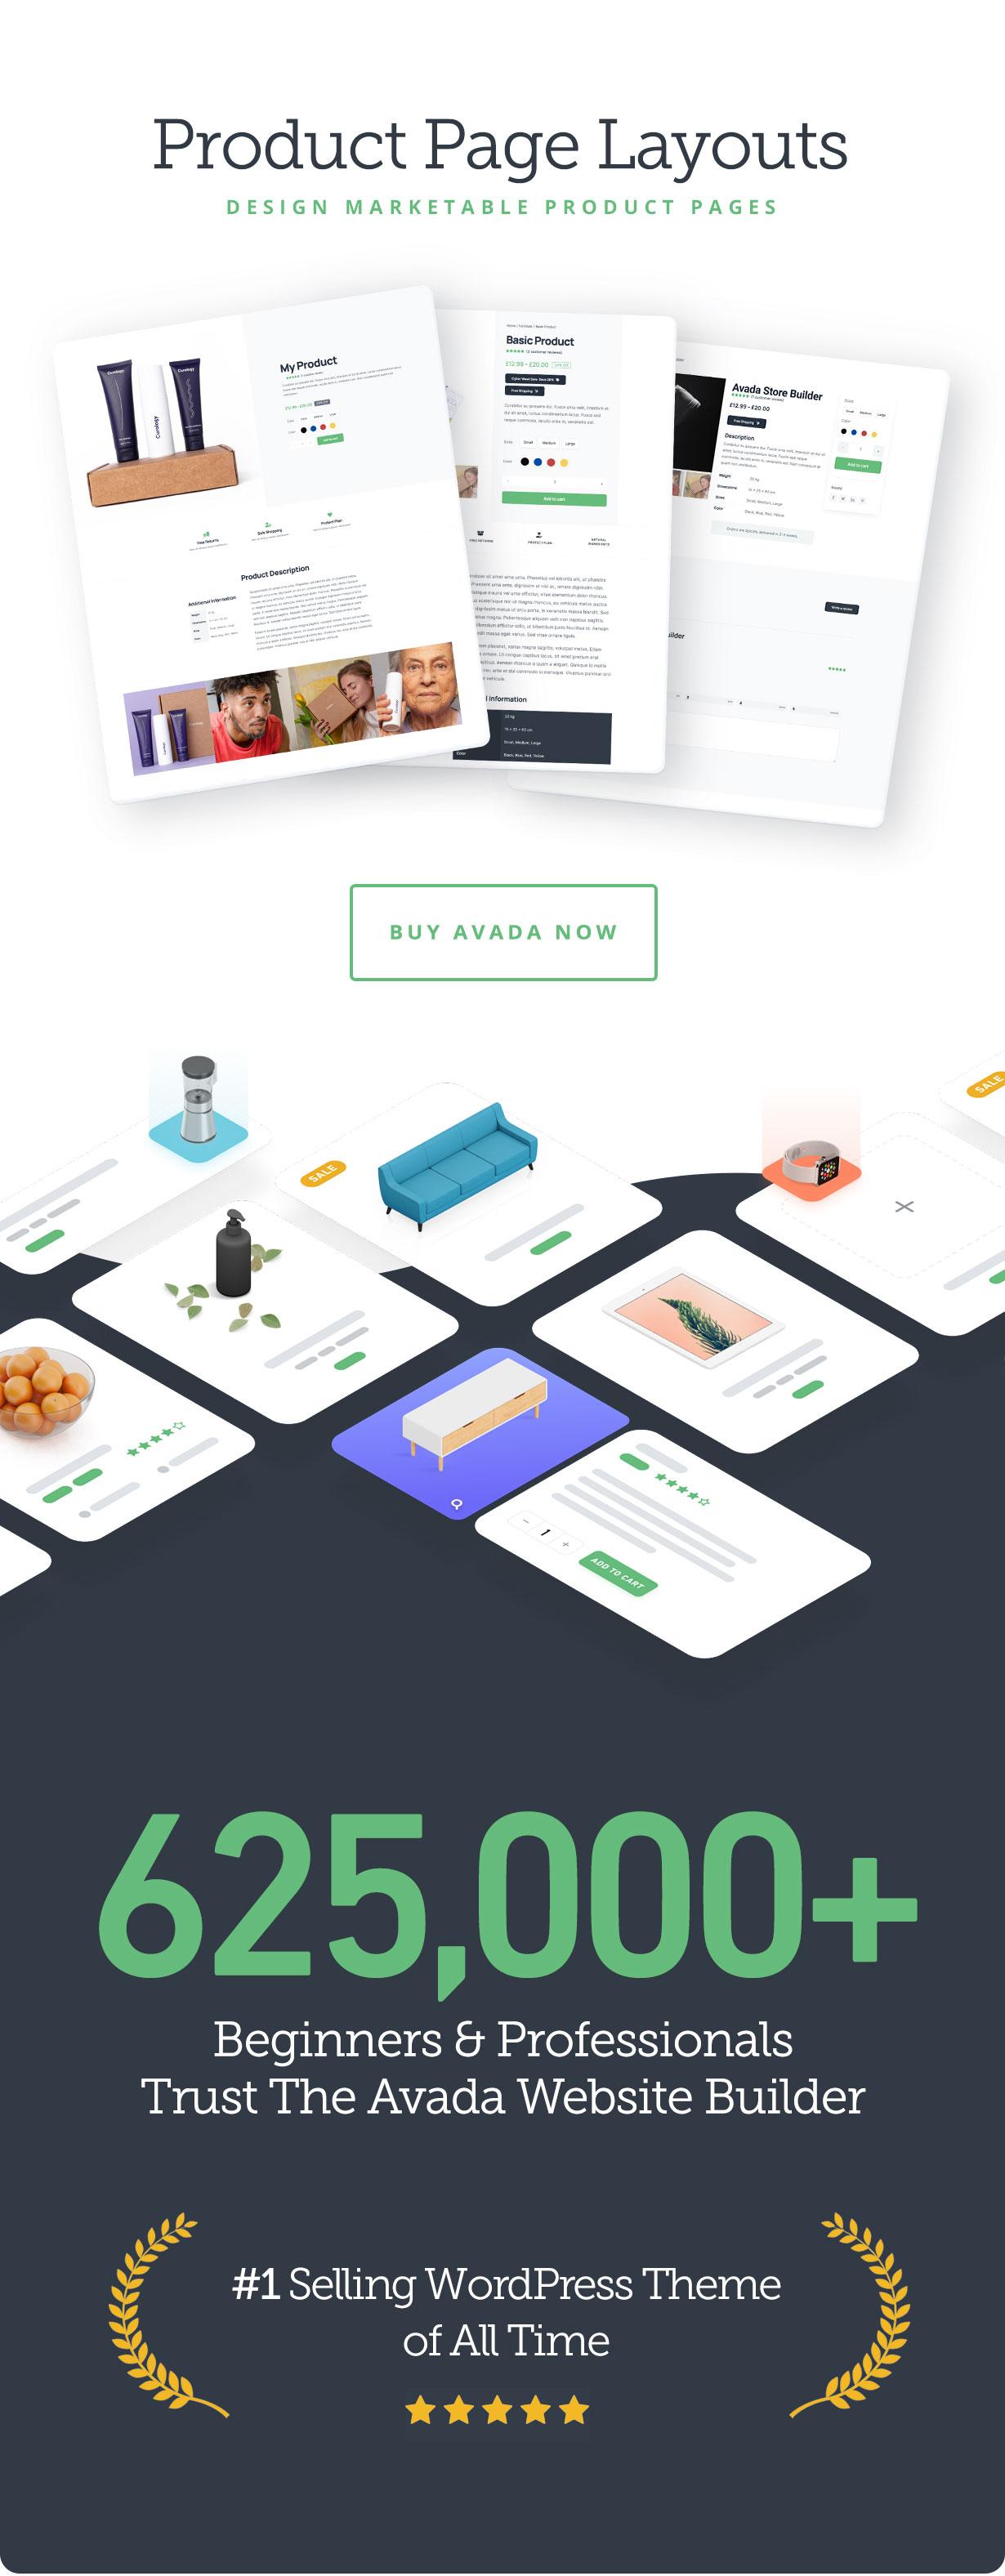 Avada | Website Builder For WordPress & WooCommerce - 3